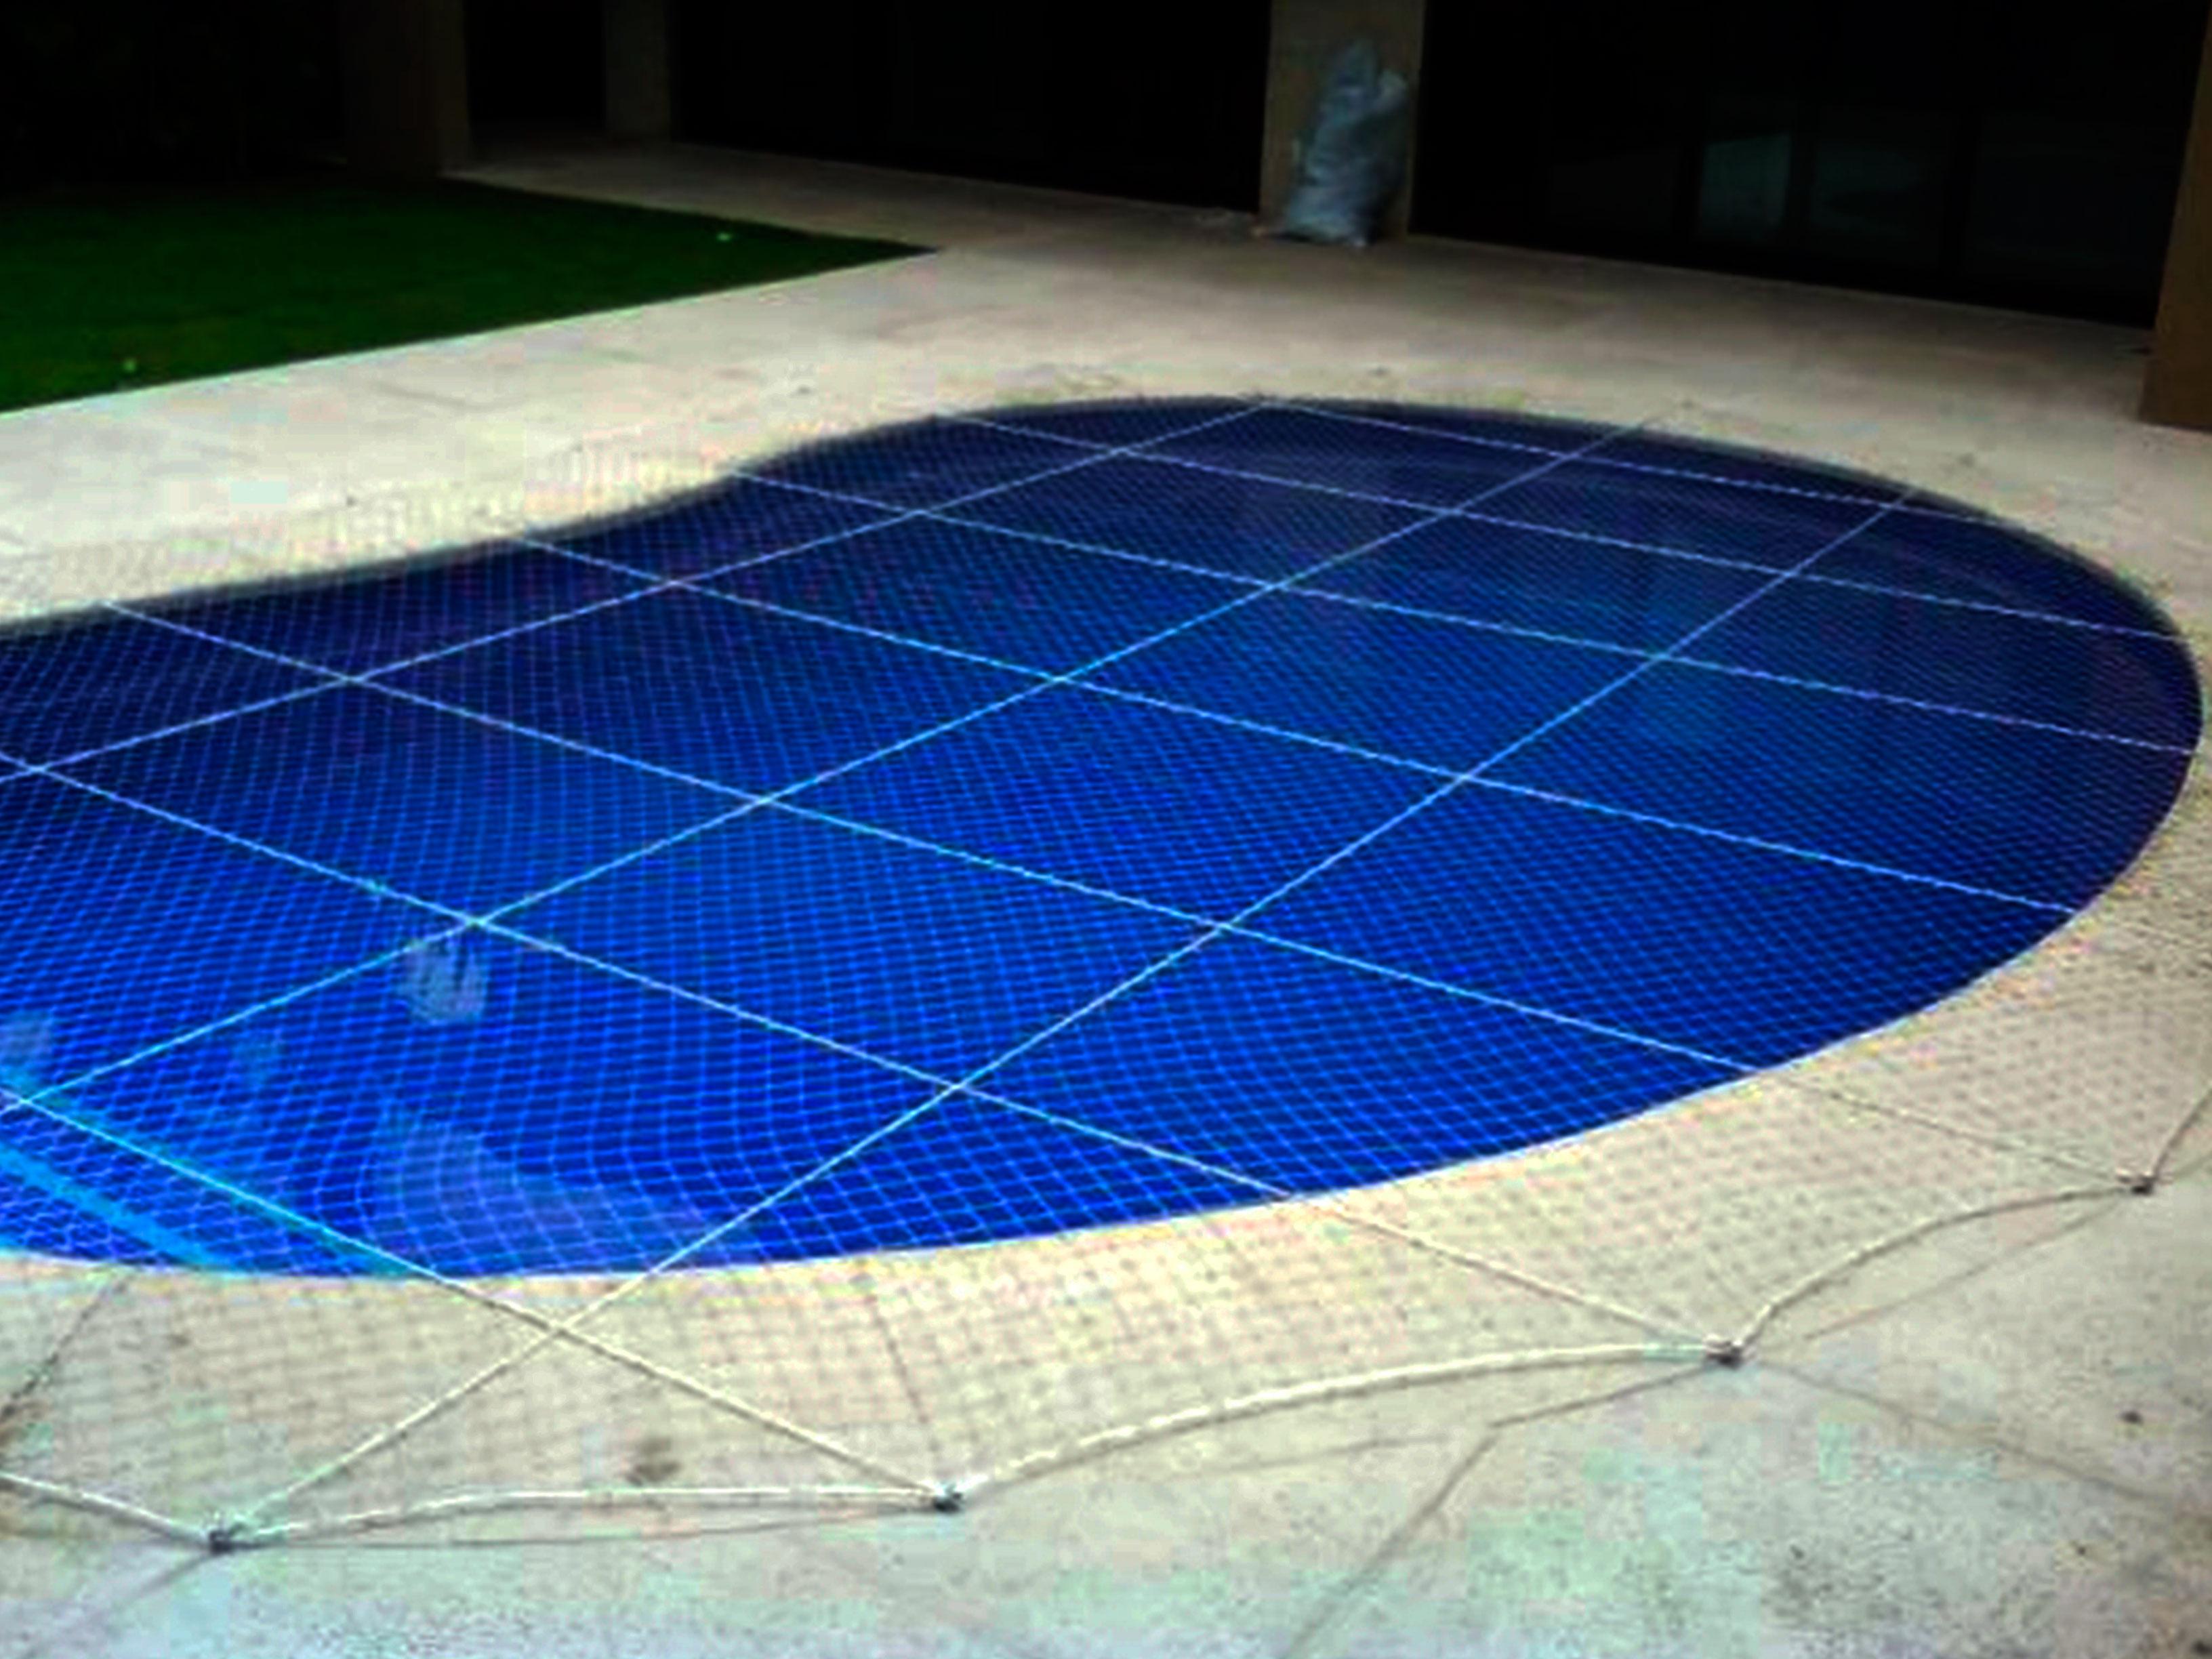 Rede de prote o para piscina devarim redes de prote o for Mp3 para piscina